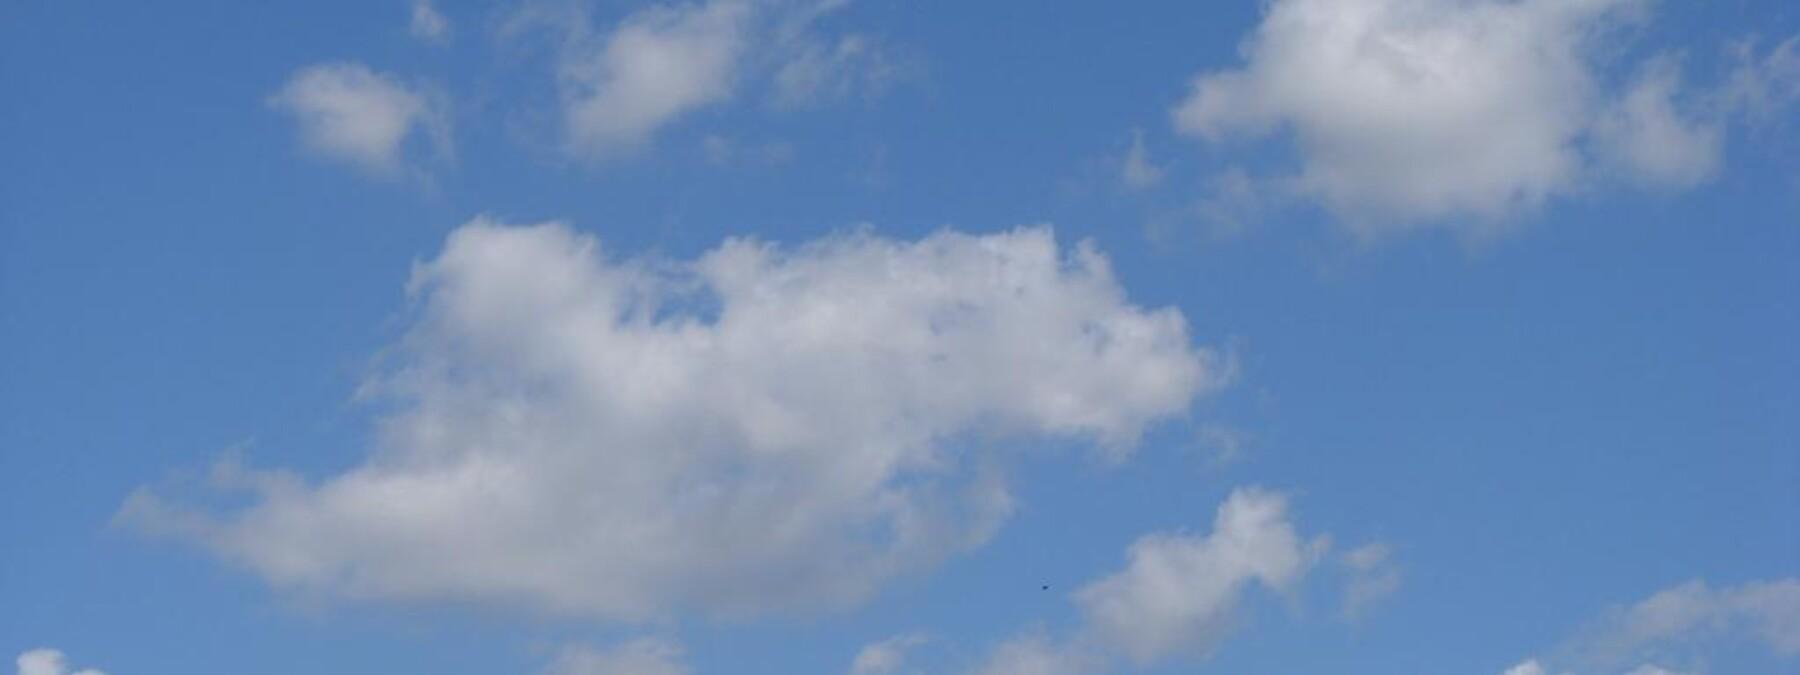 pascal arnoux